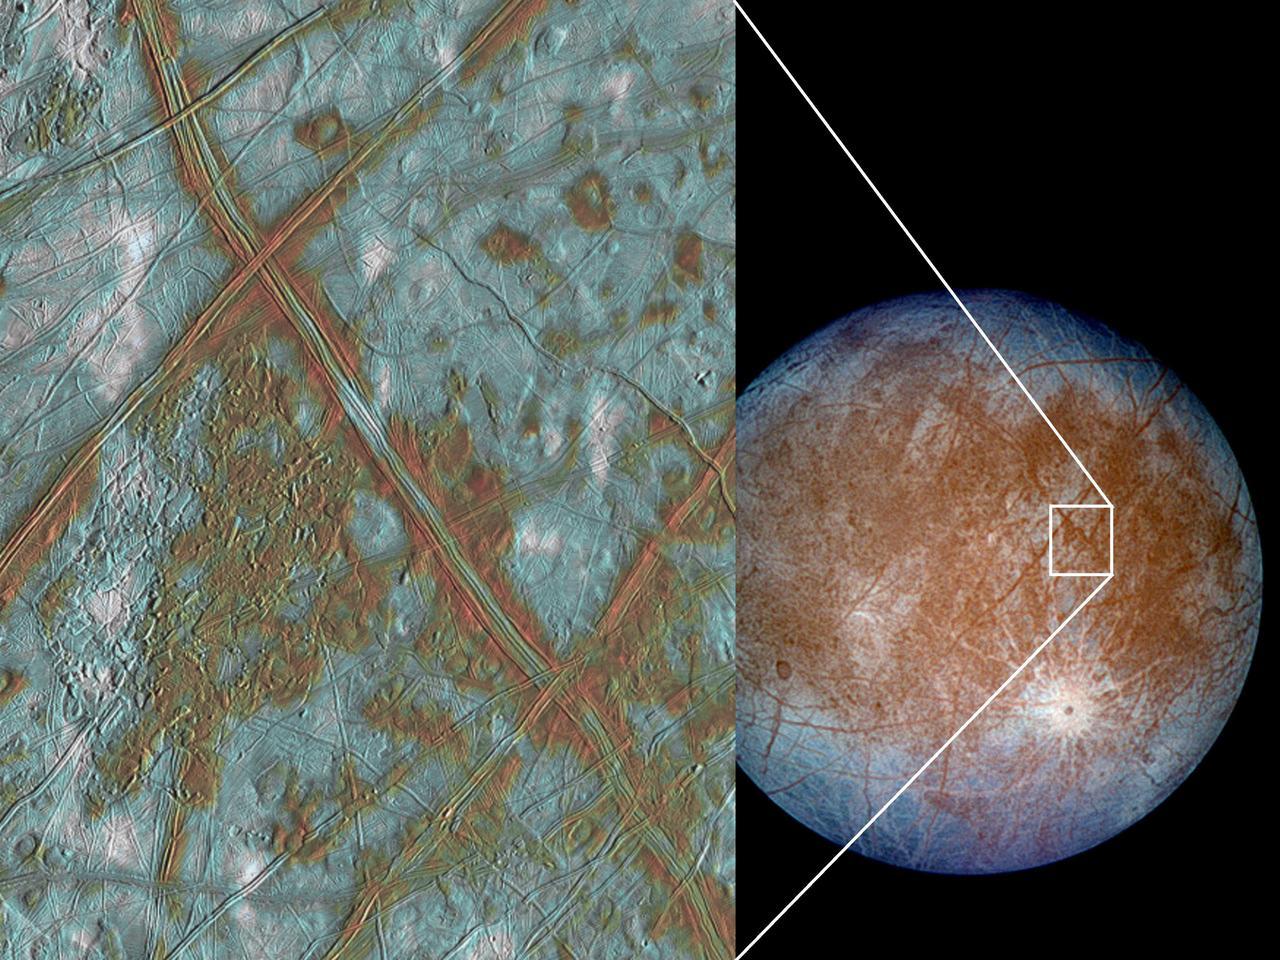 Hubble captures rare image of triple Jupiter transit